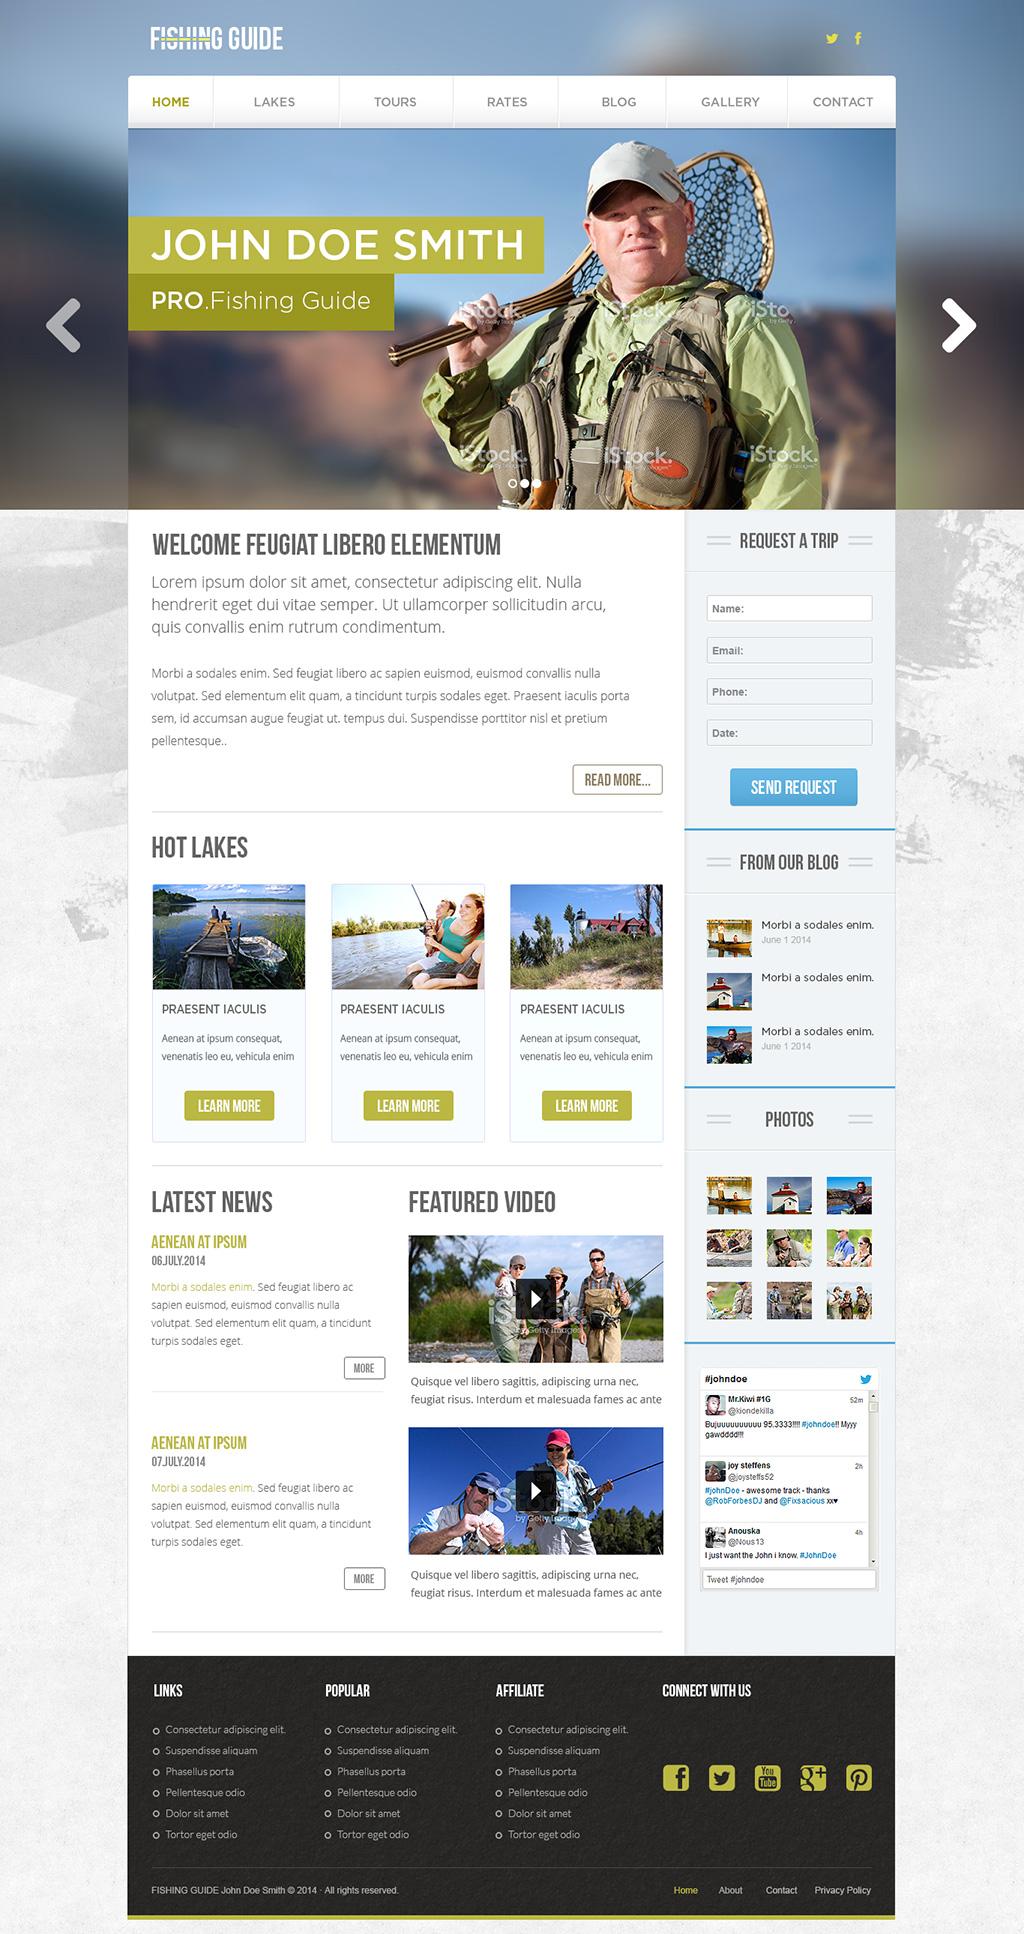 PRO Fishing Guide Theme - A